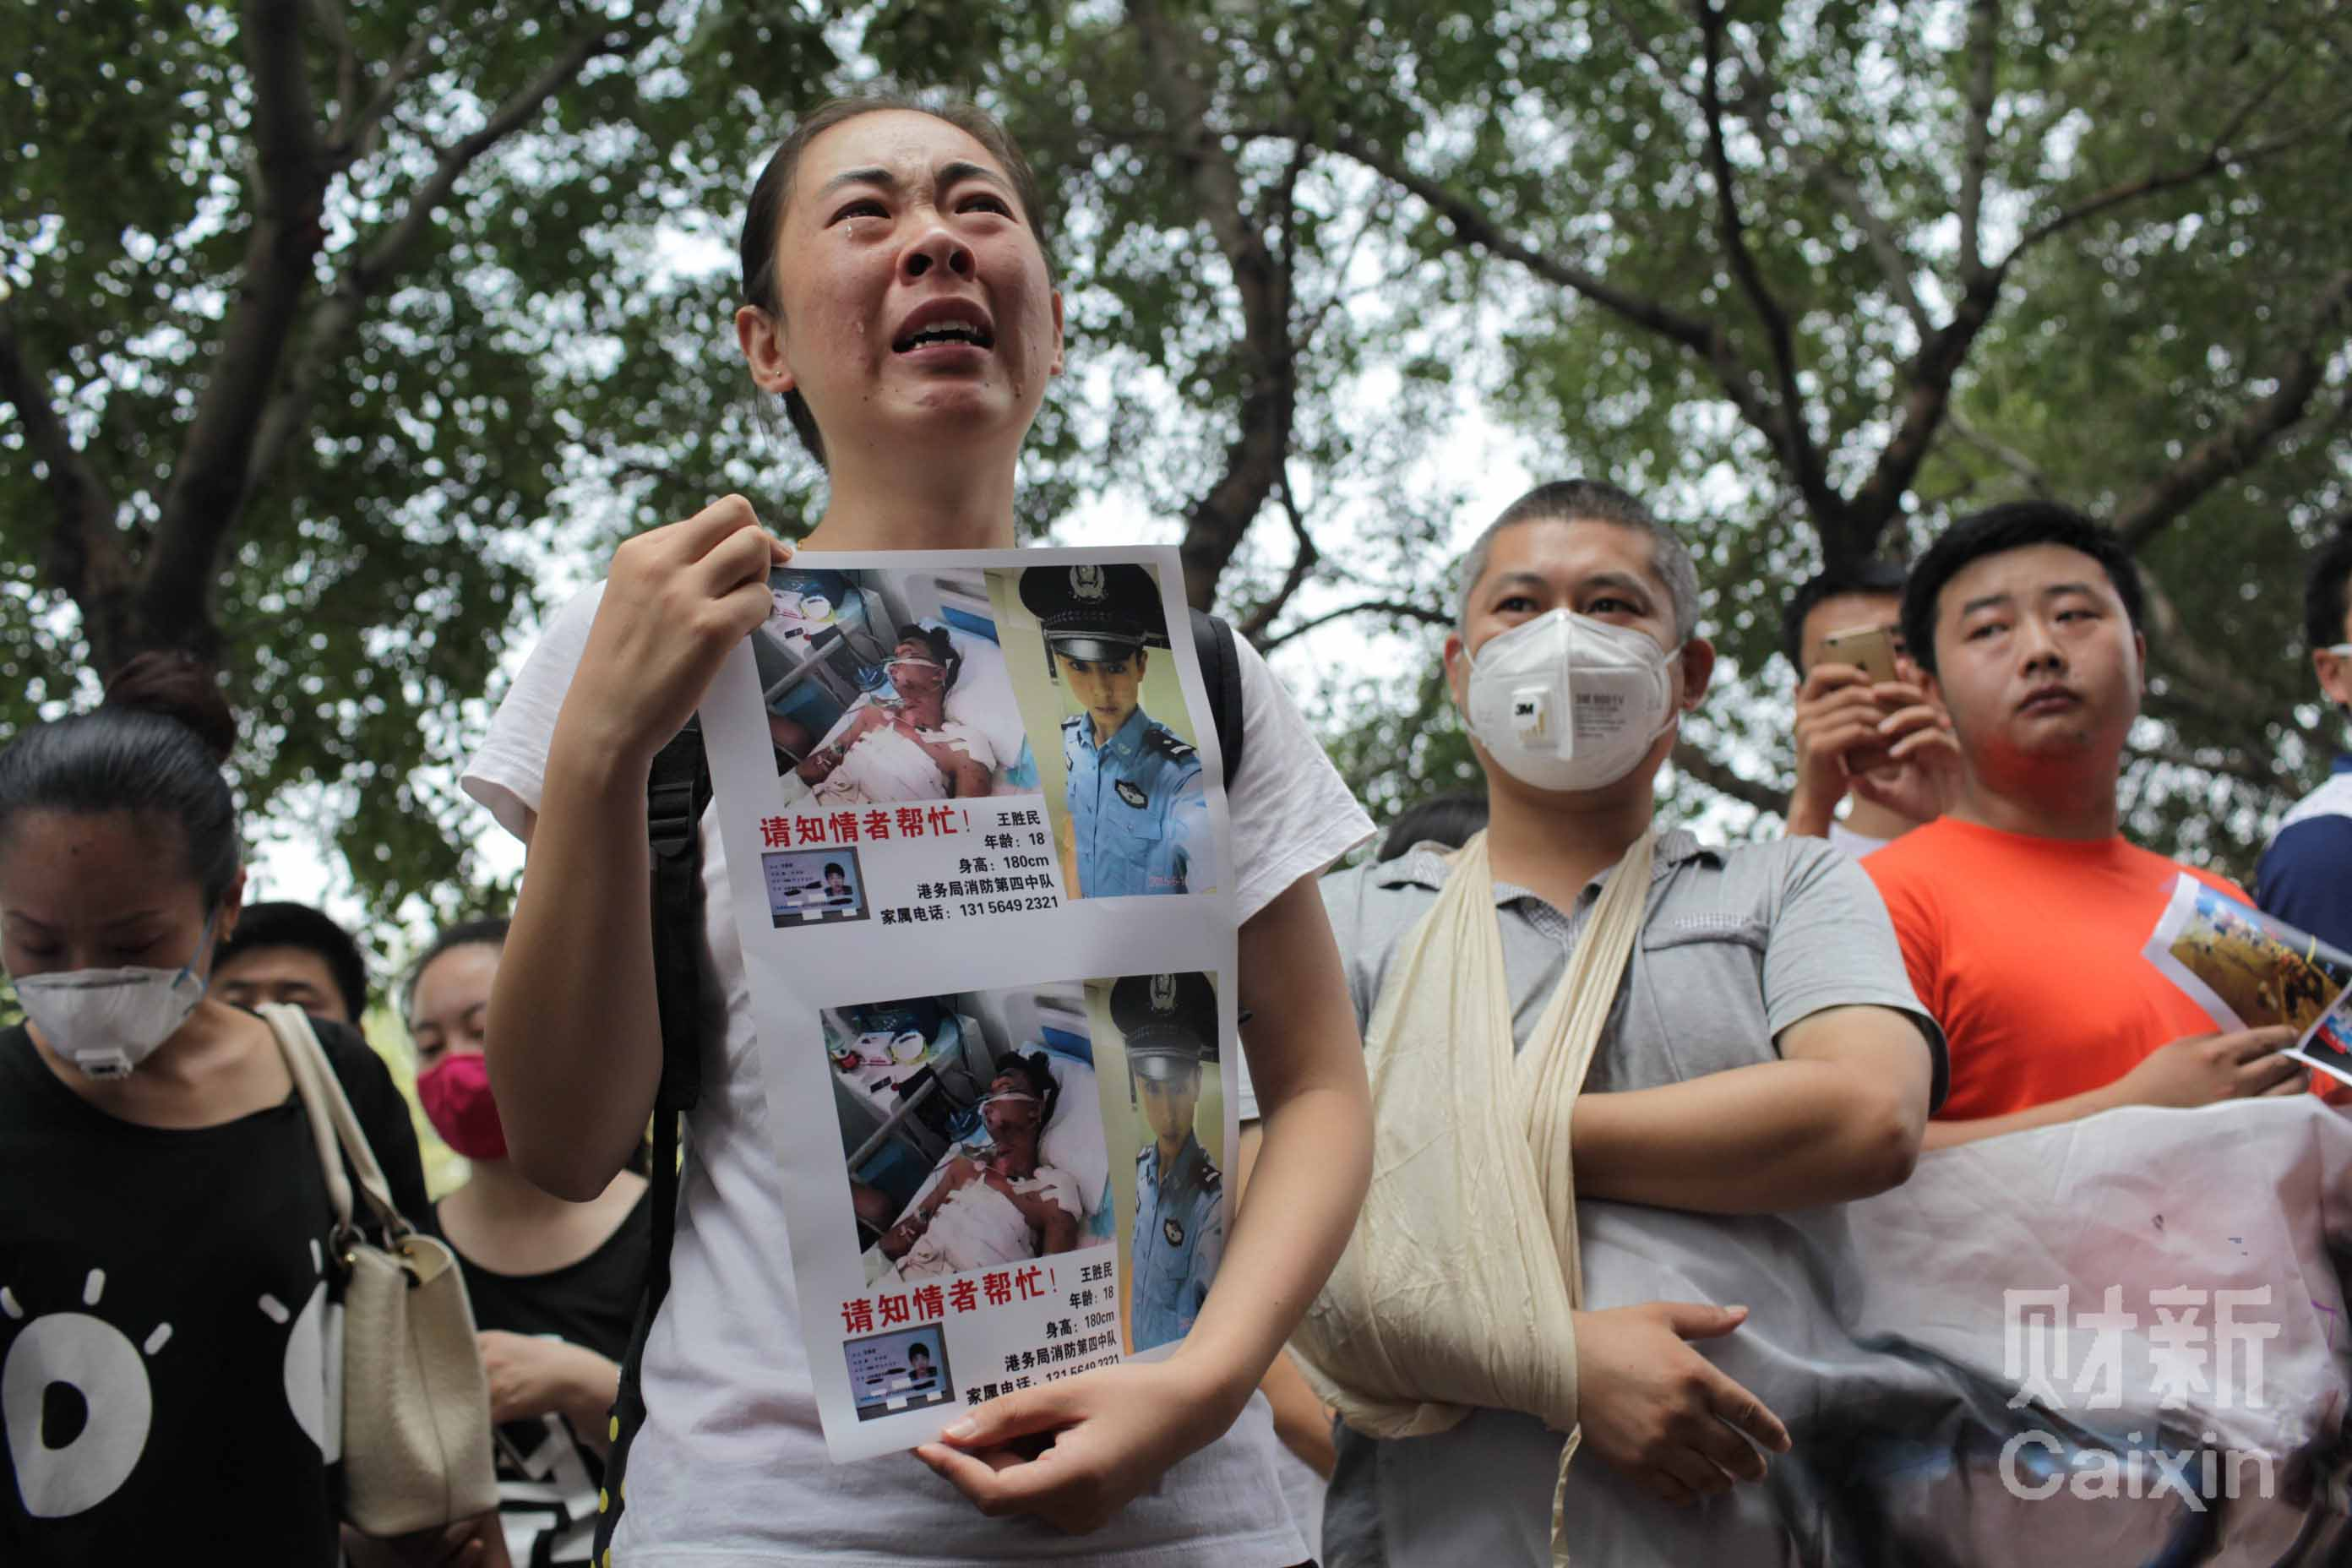 IMG_0194 港务局消防第四中队王胜民的家人举着照片在美华大酒店门前哭诉。副本-10